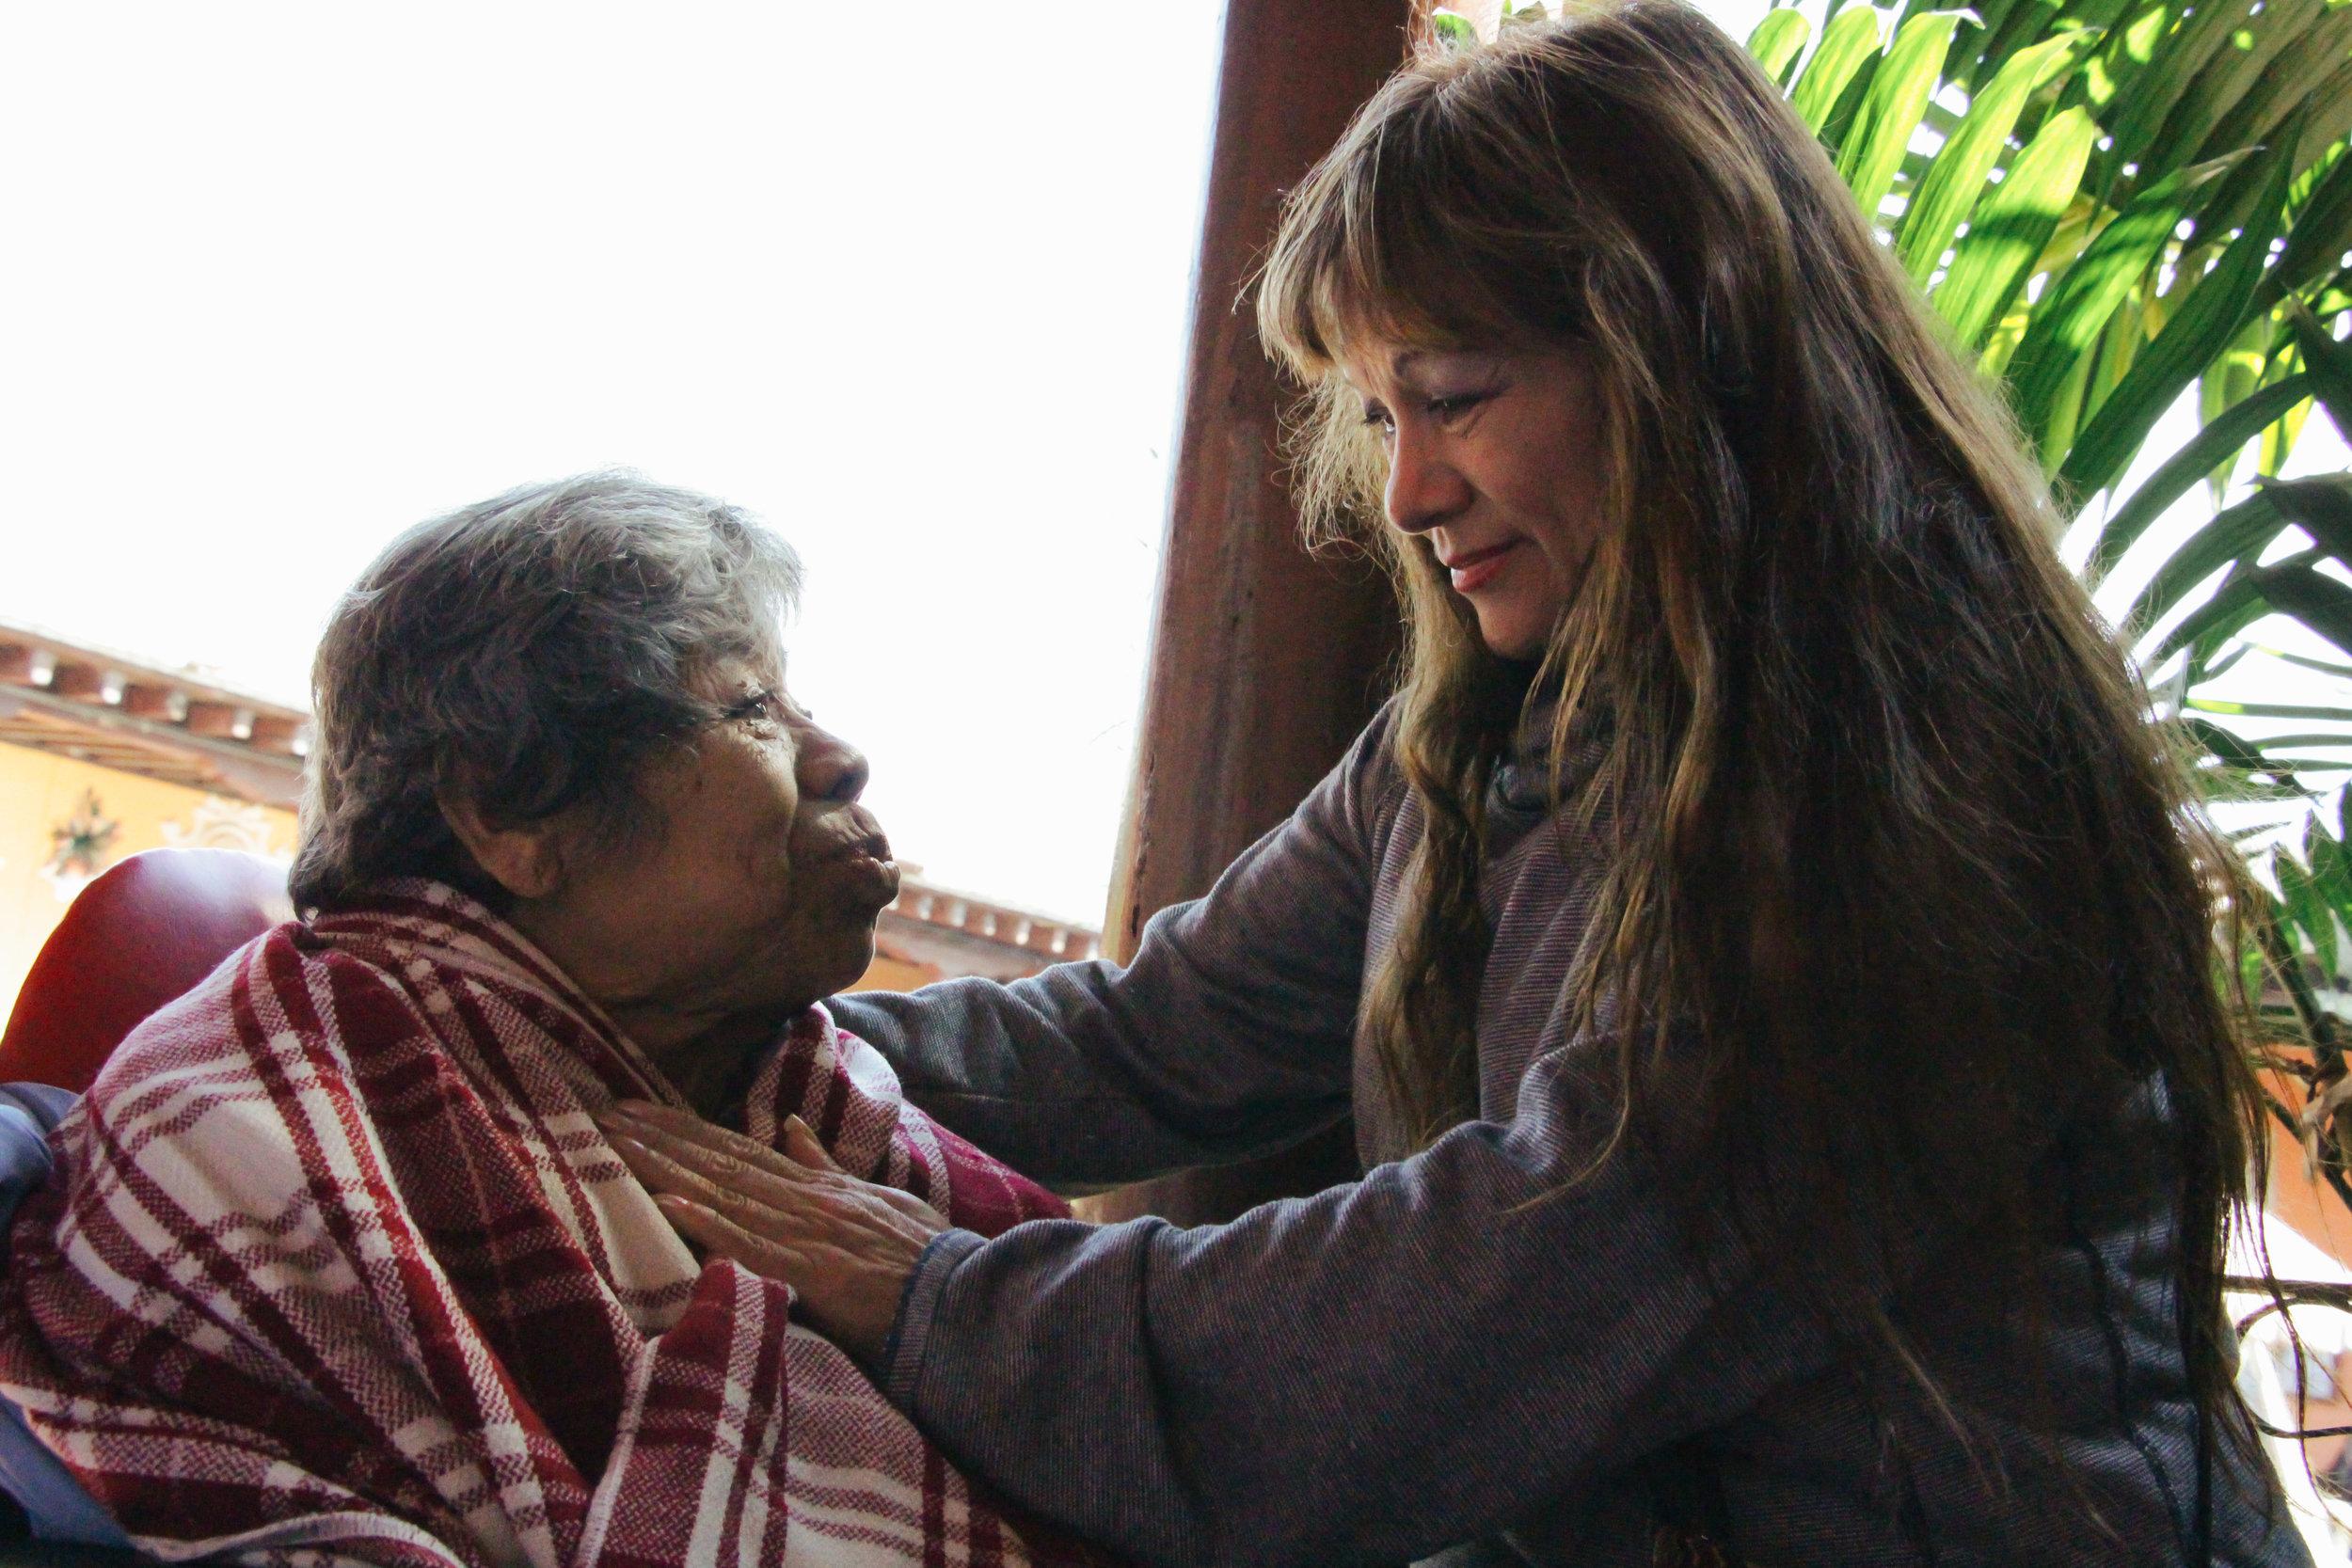 LIDIA ESCOBEDO CHECKS IN ON HER PATIENT MARGARITA PATZAN, 72, AT HOGAR DE ANCIANOS FRAY RODRIGO DE LA CRUZ ON JAN. 17. PATZAN EXPERIENCED INCREASED MOBILITY AFTER RECEIVING PHYSICAL, EMOTIONAL AND SPIRITUAL THERAPY FROM ESCOBEDO.